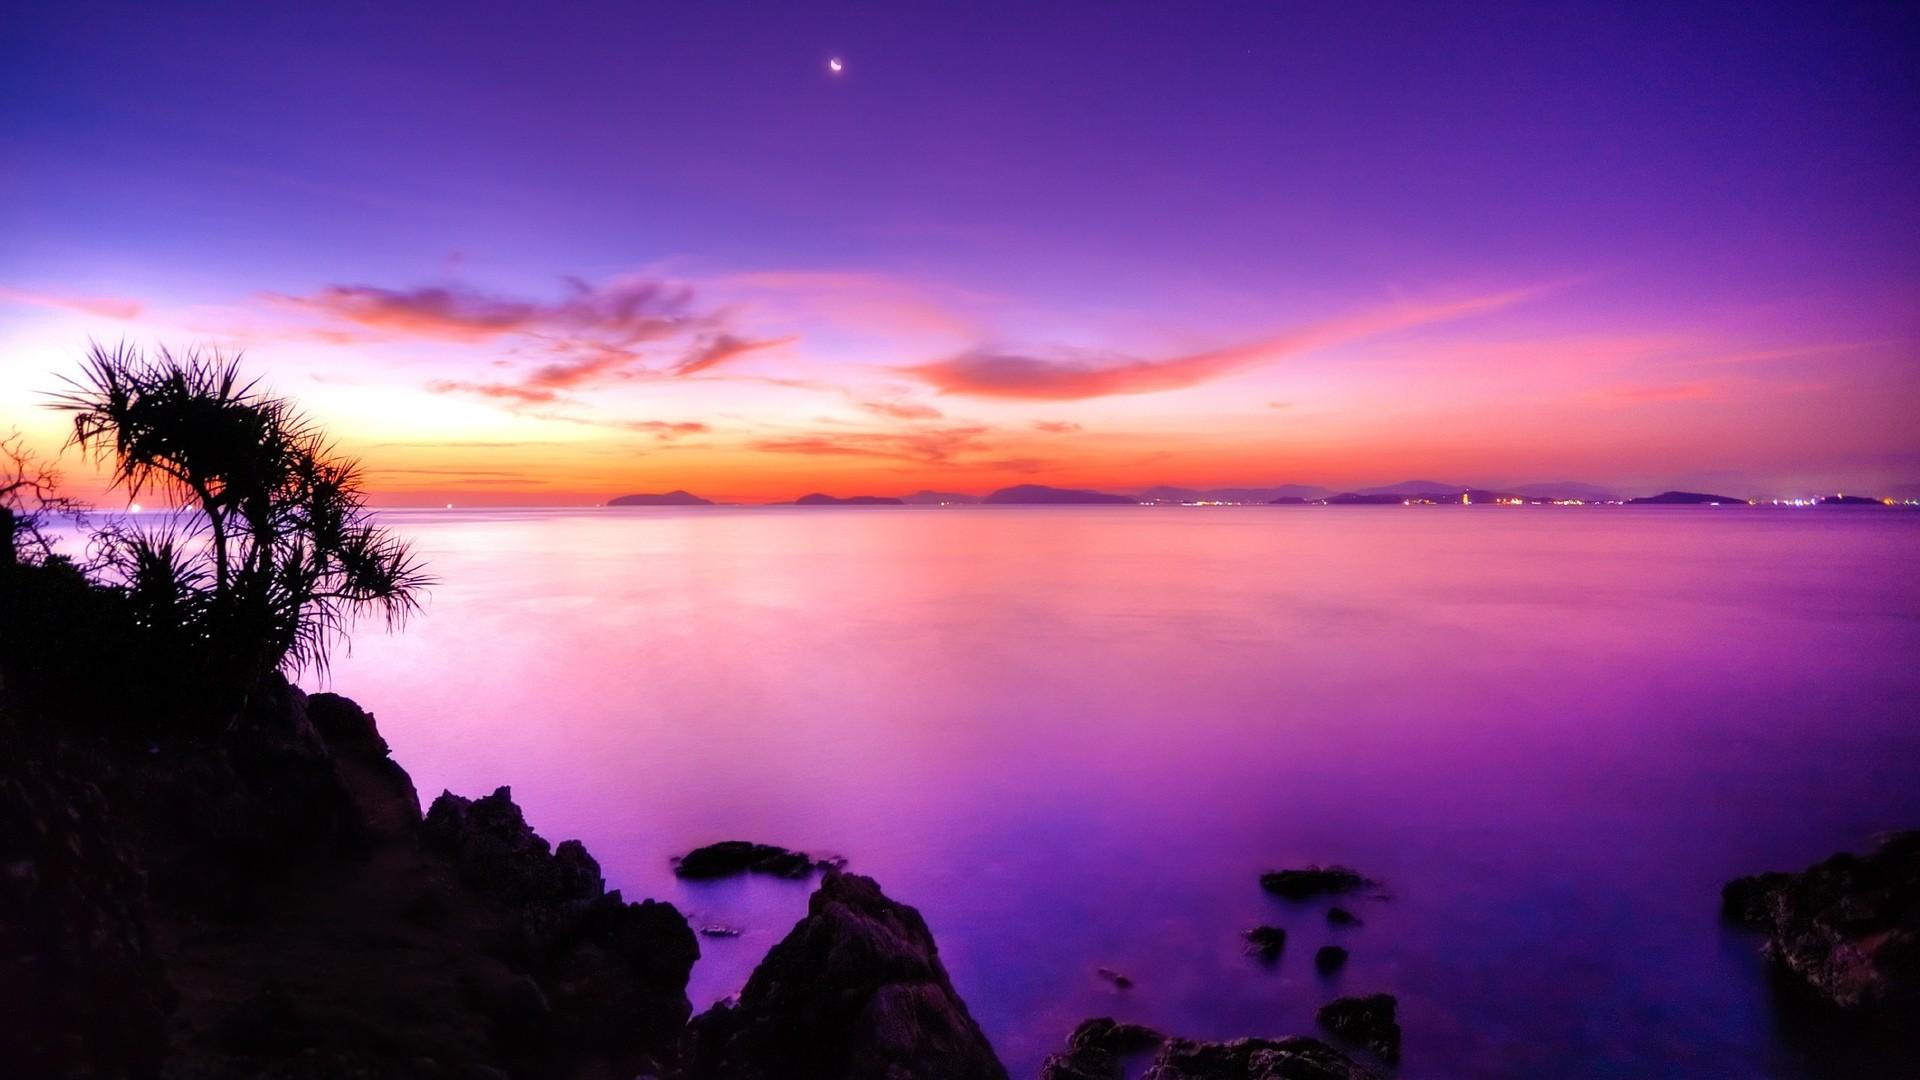 Pink Sunset Pic